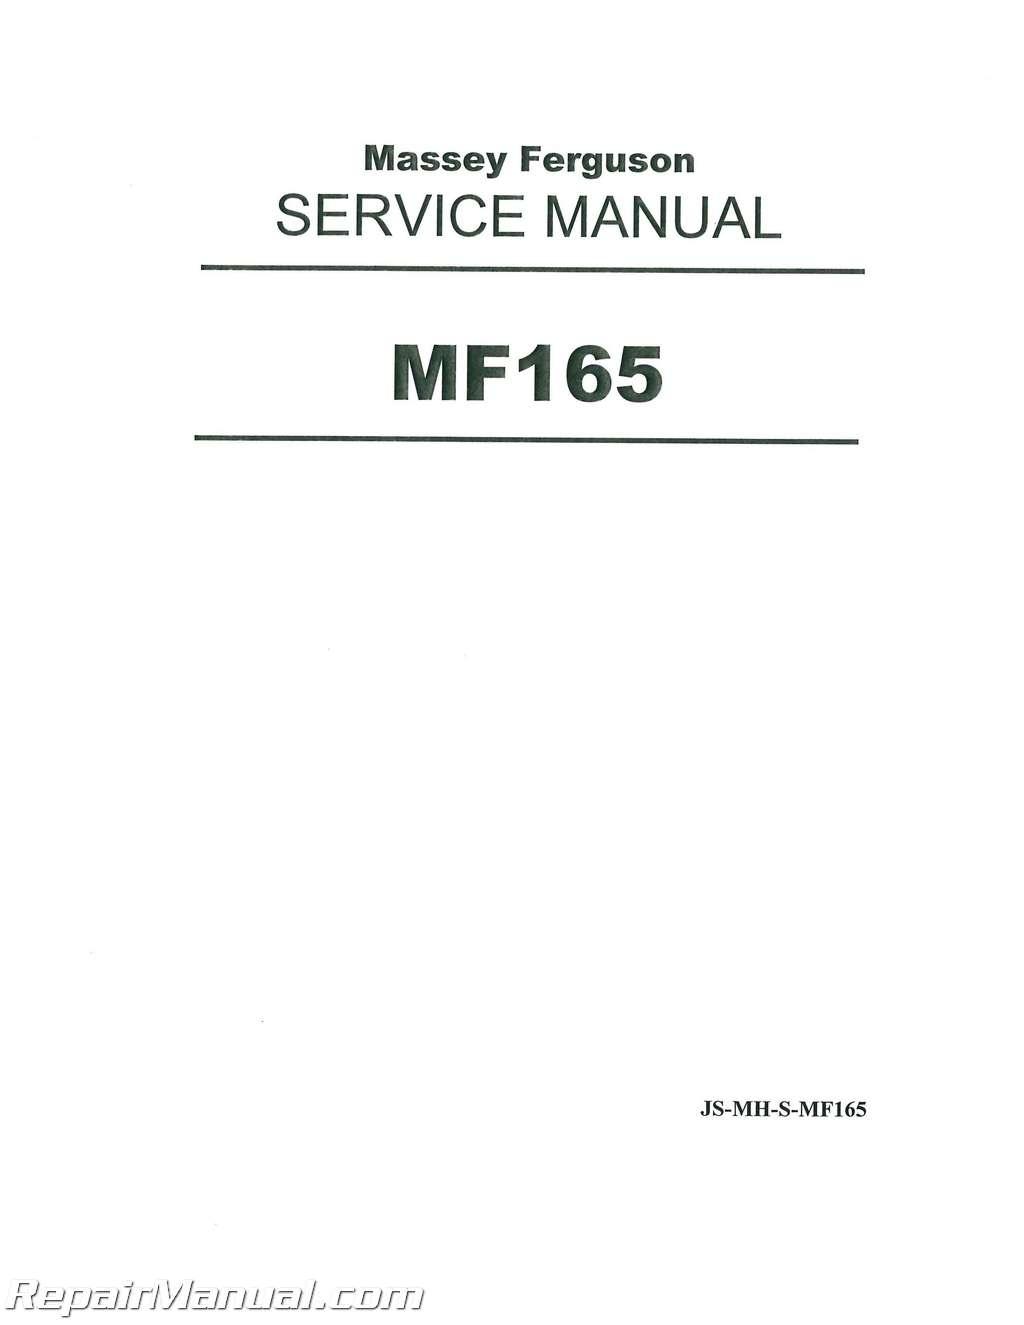 massey ferguson 175 parts diagram industrial wiring mf150 mf165 mf175 mf180 tractor service manual